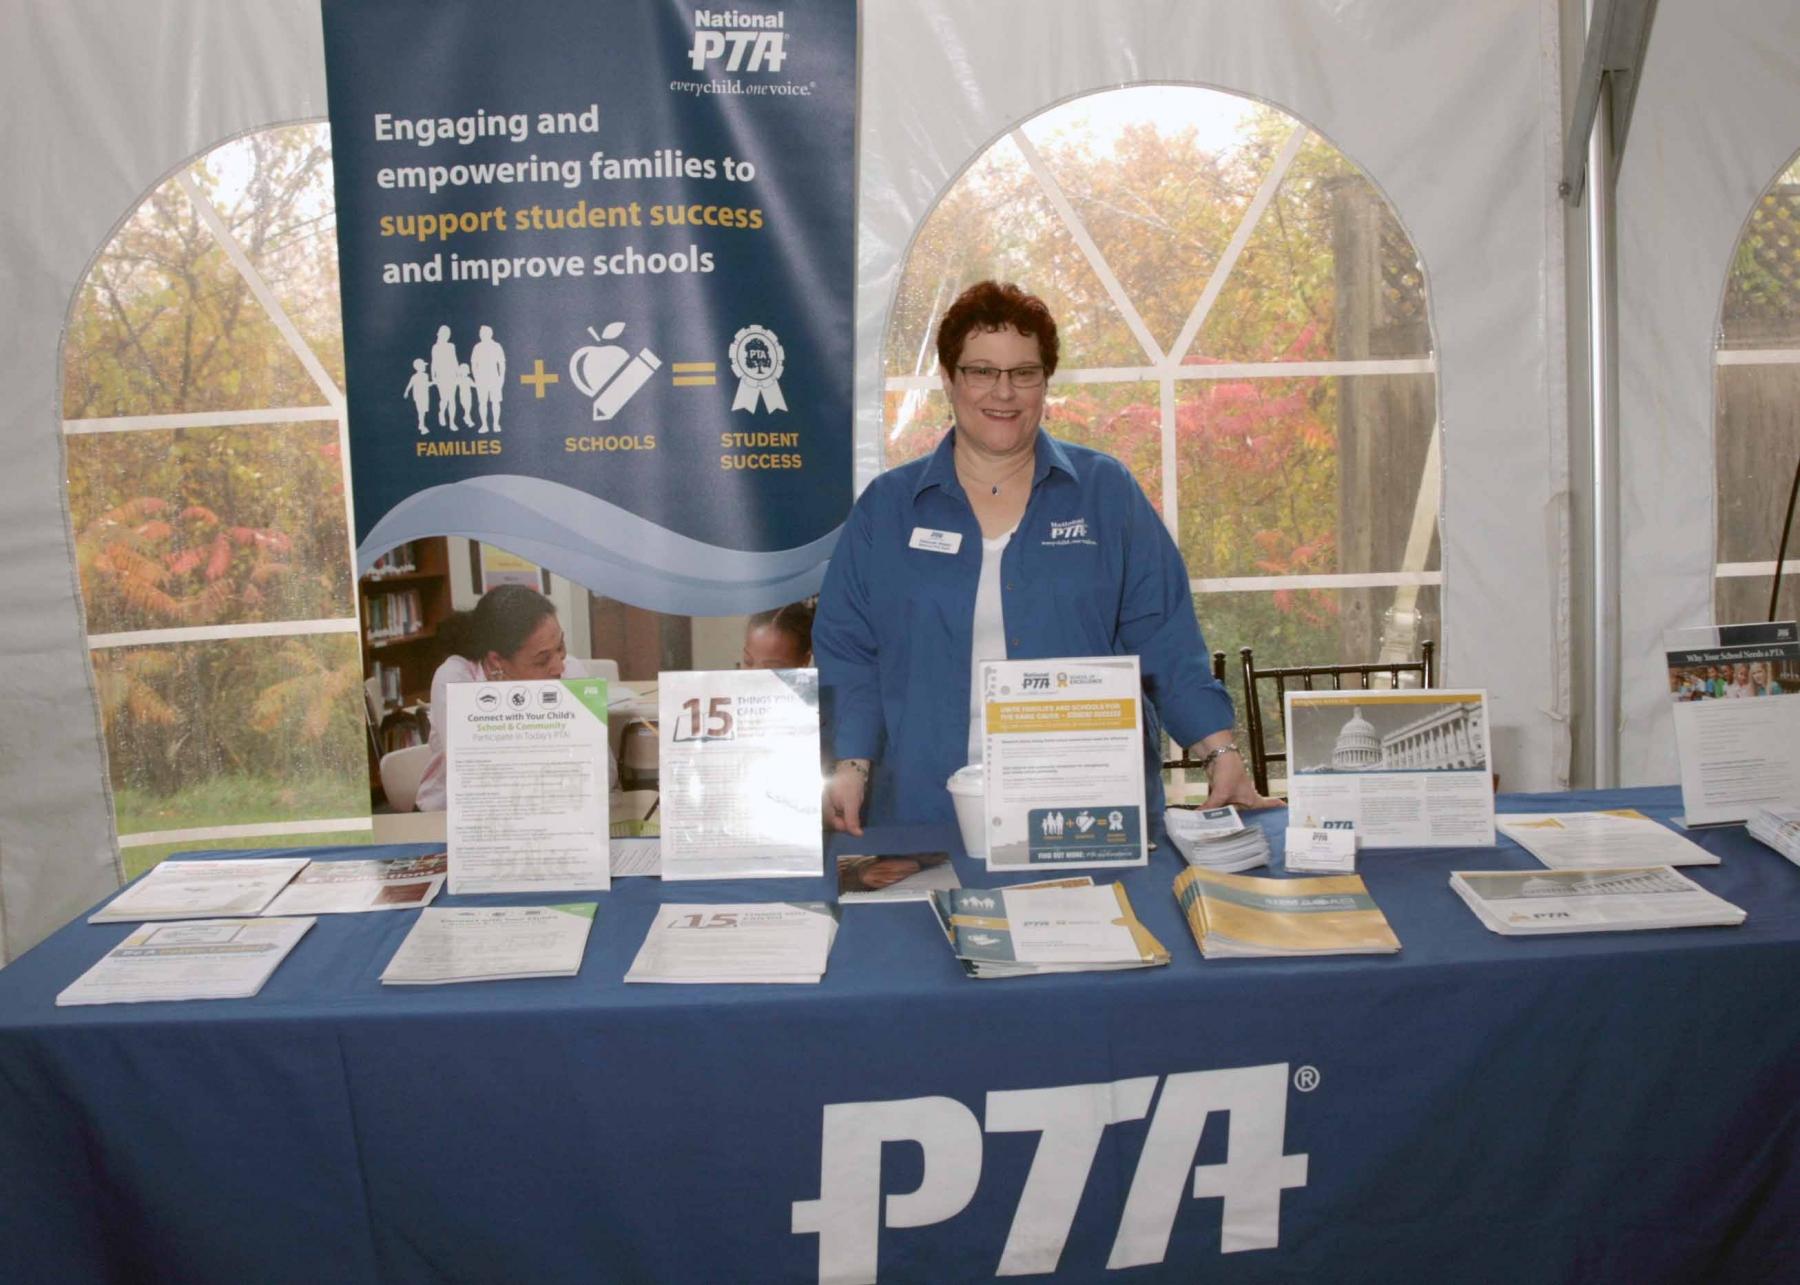 Deborah Walsh, PTA National Service Manager